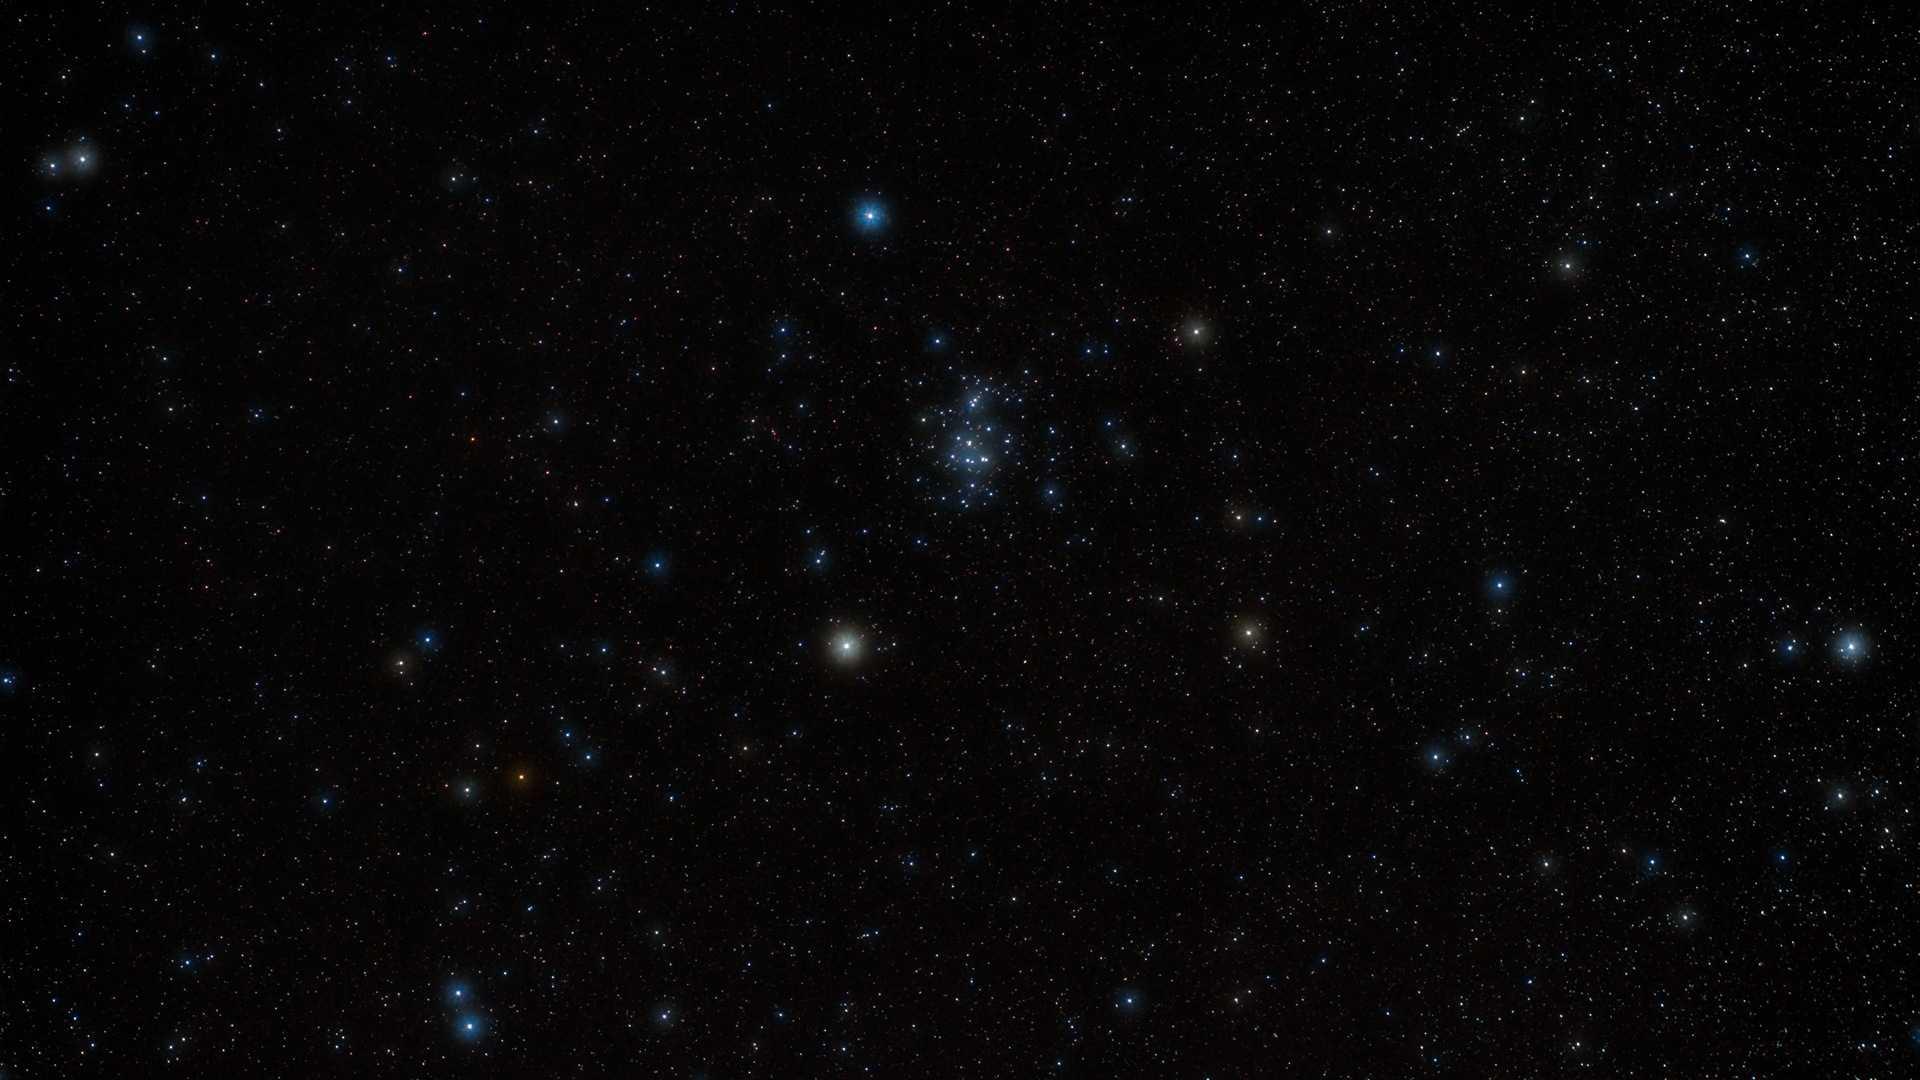 M44_4_Ade.jpg